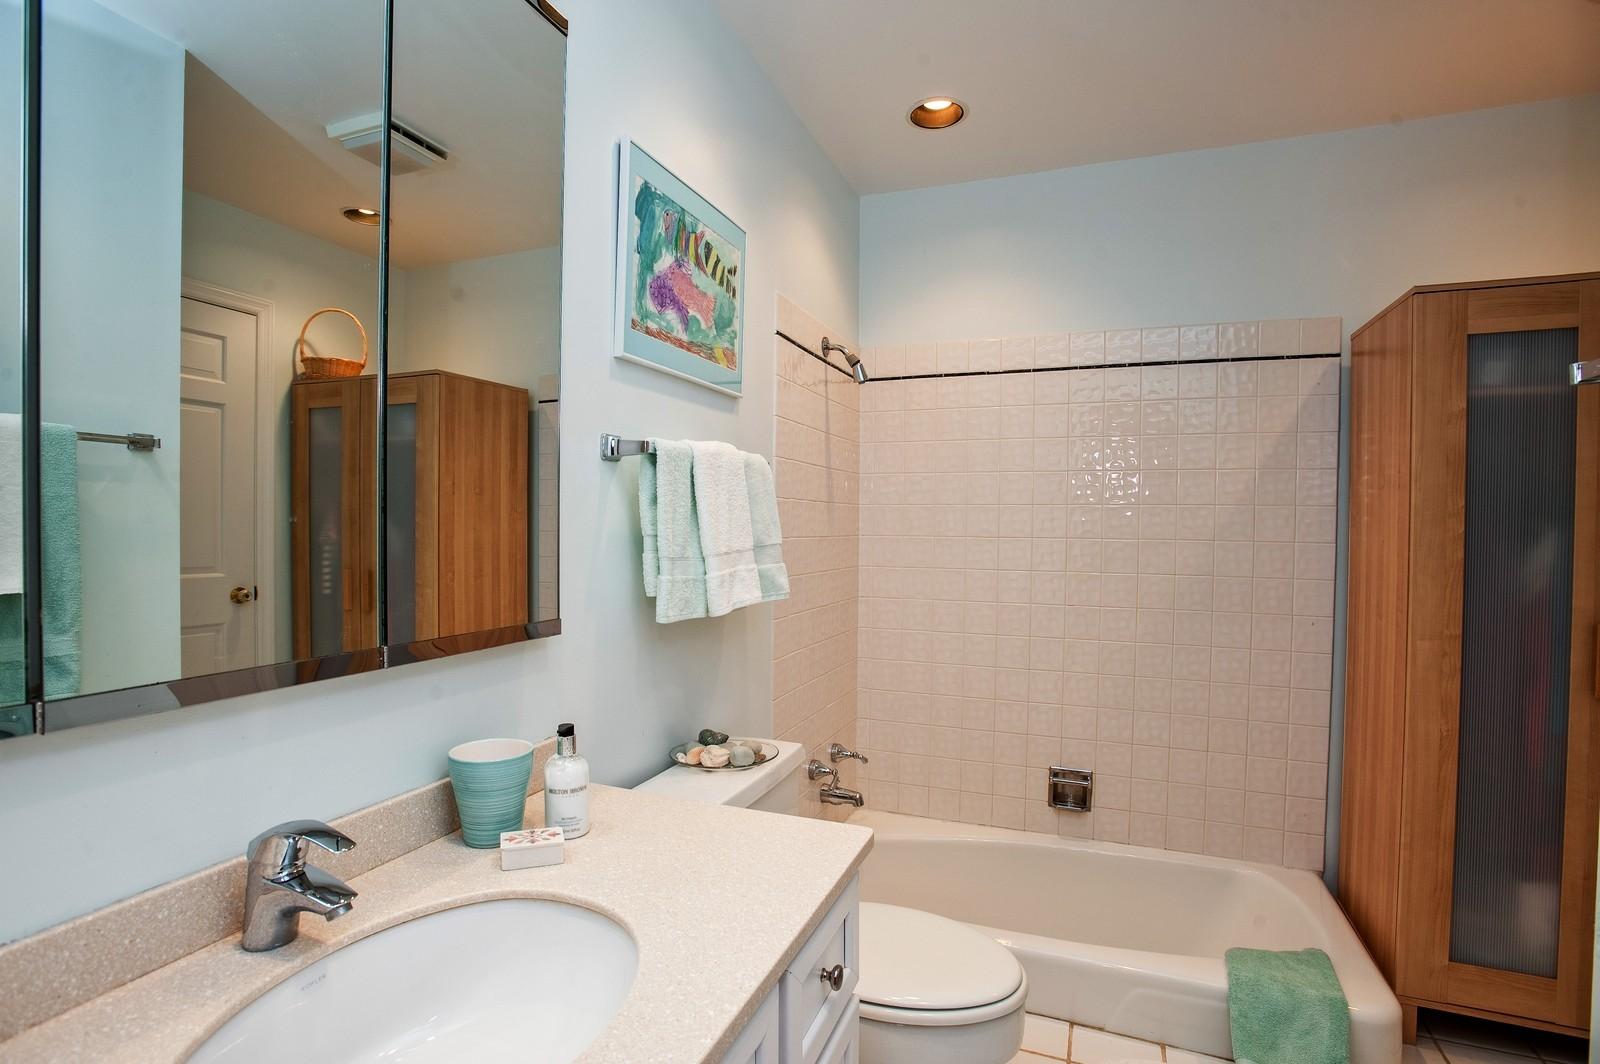 Real Estate Photography - 389 Bristol, Northfield, IL, 60093 - Master Bathroom